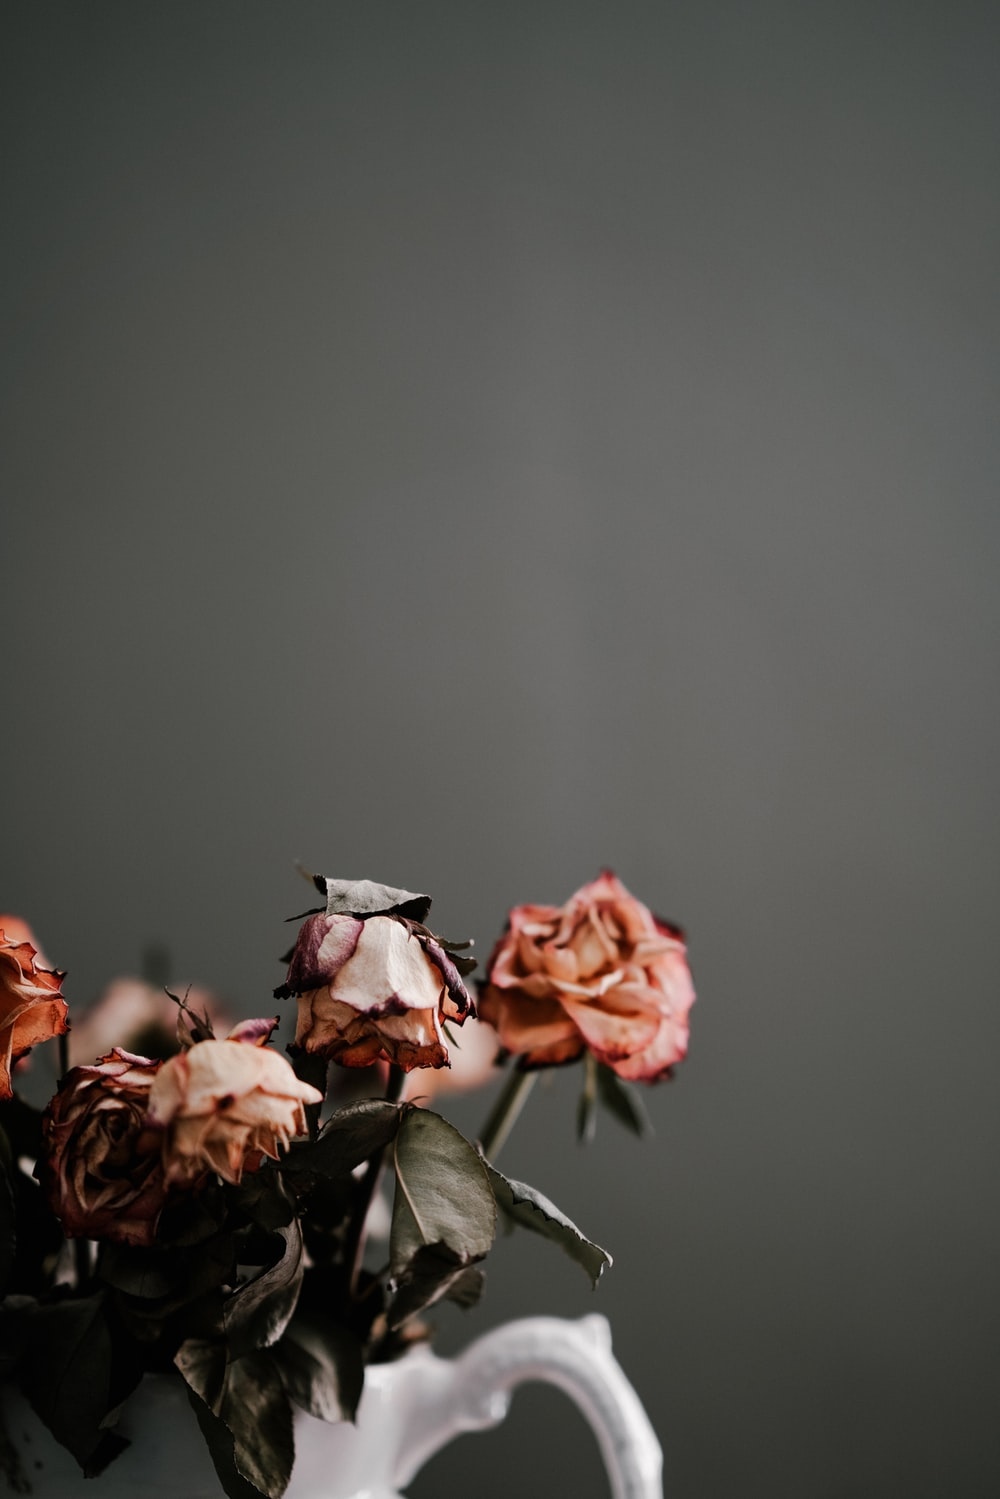 roses on vase